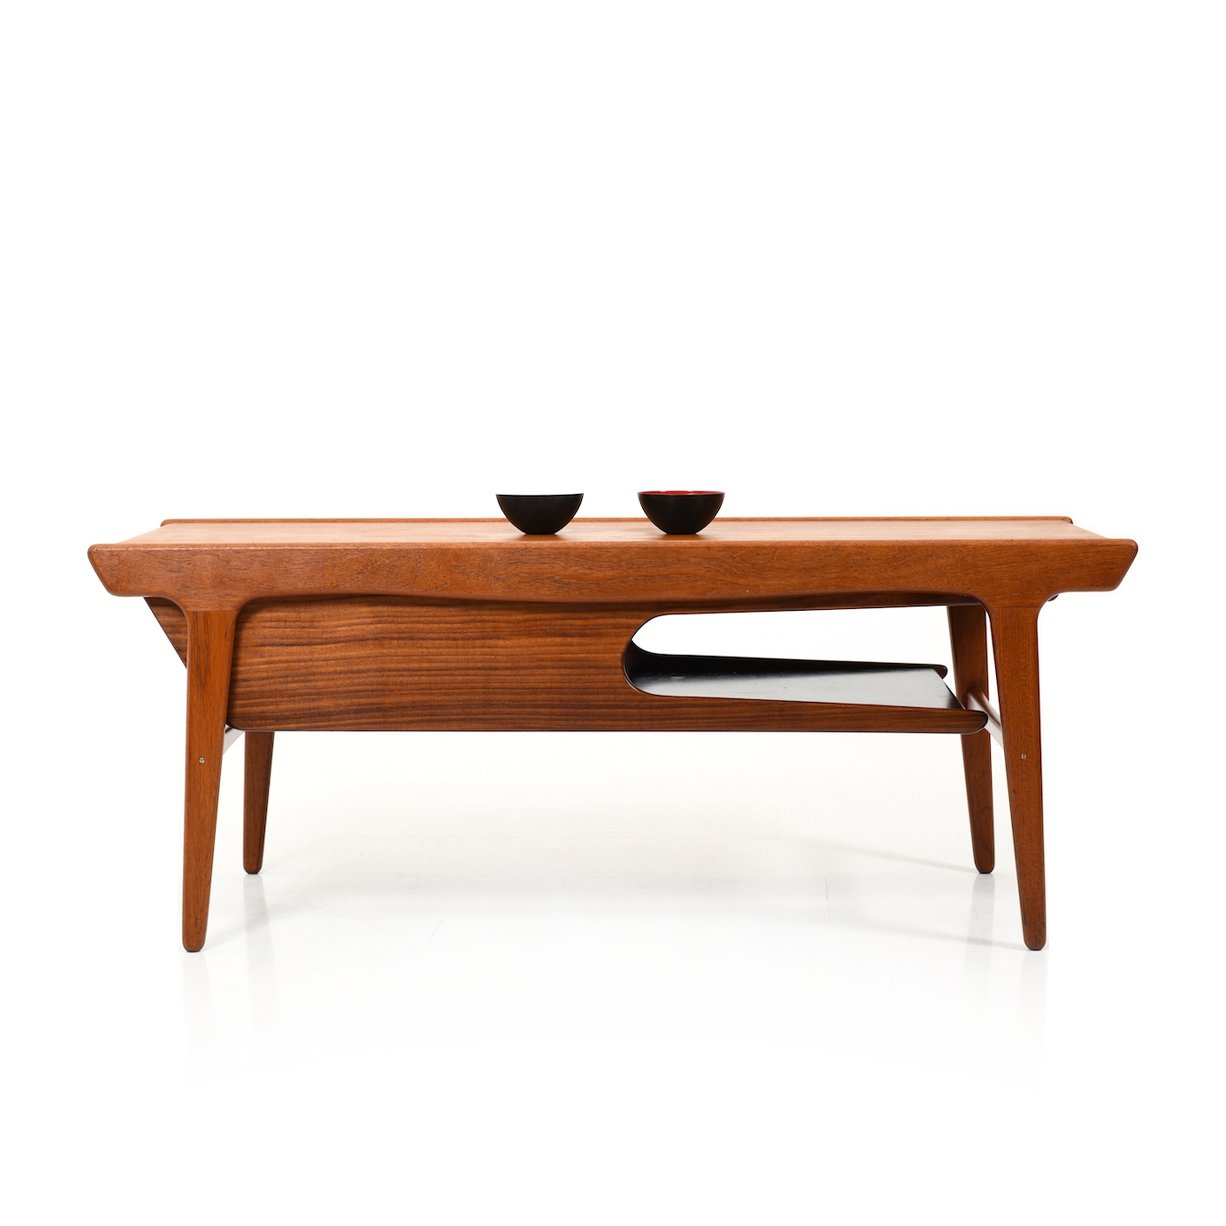 Rare Mid Century Danish Teak Sofa Table With Formica Inlays 134187